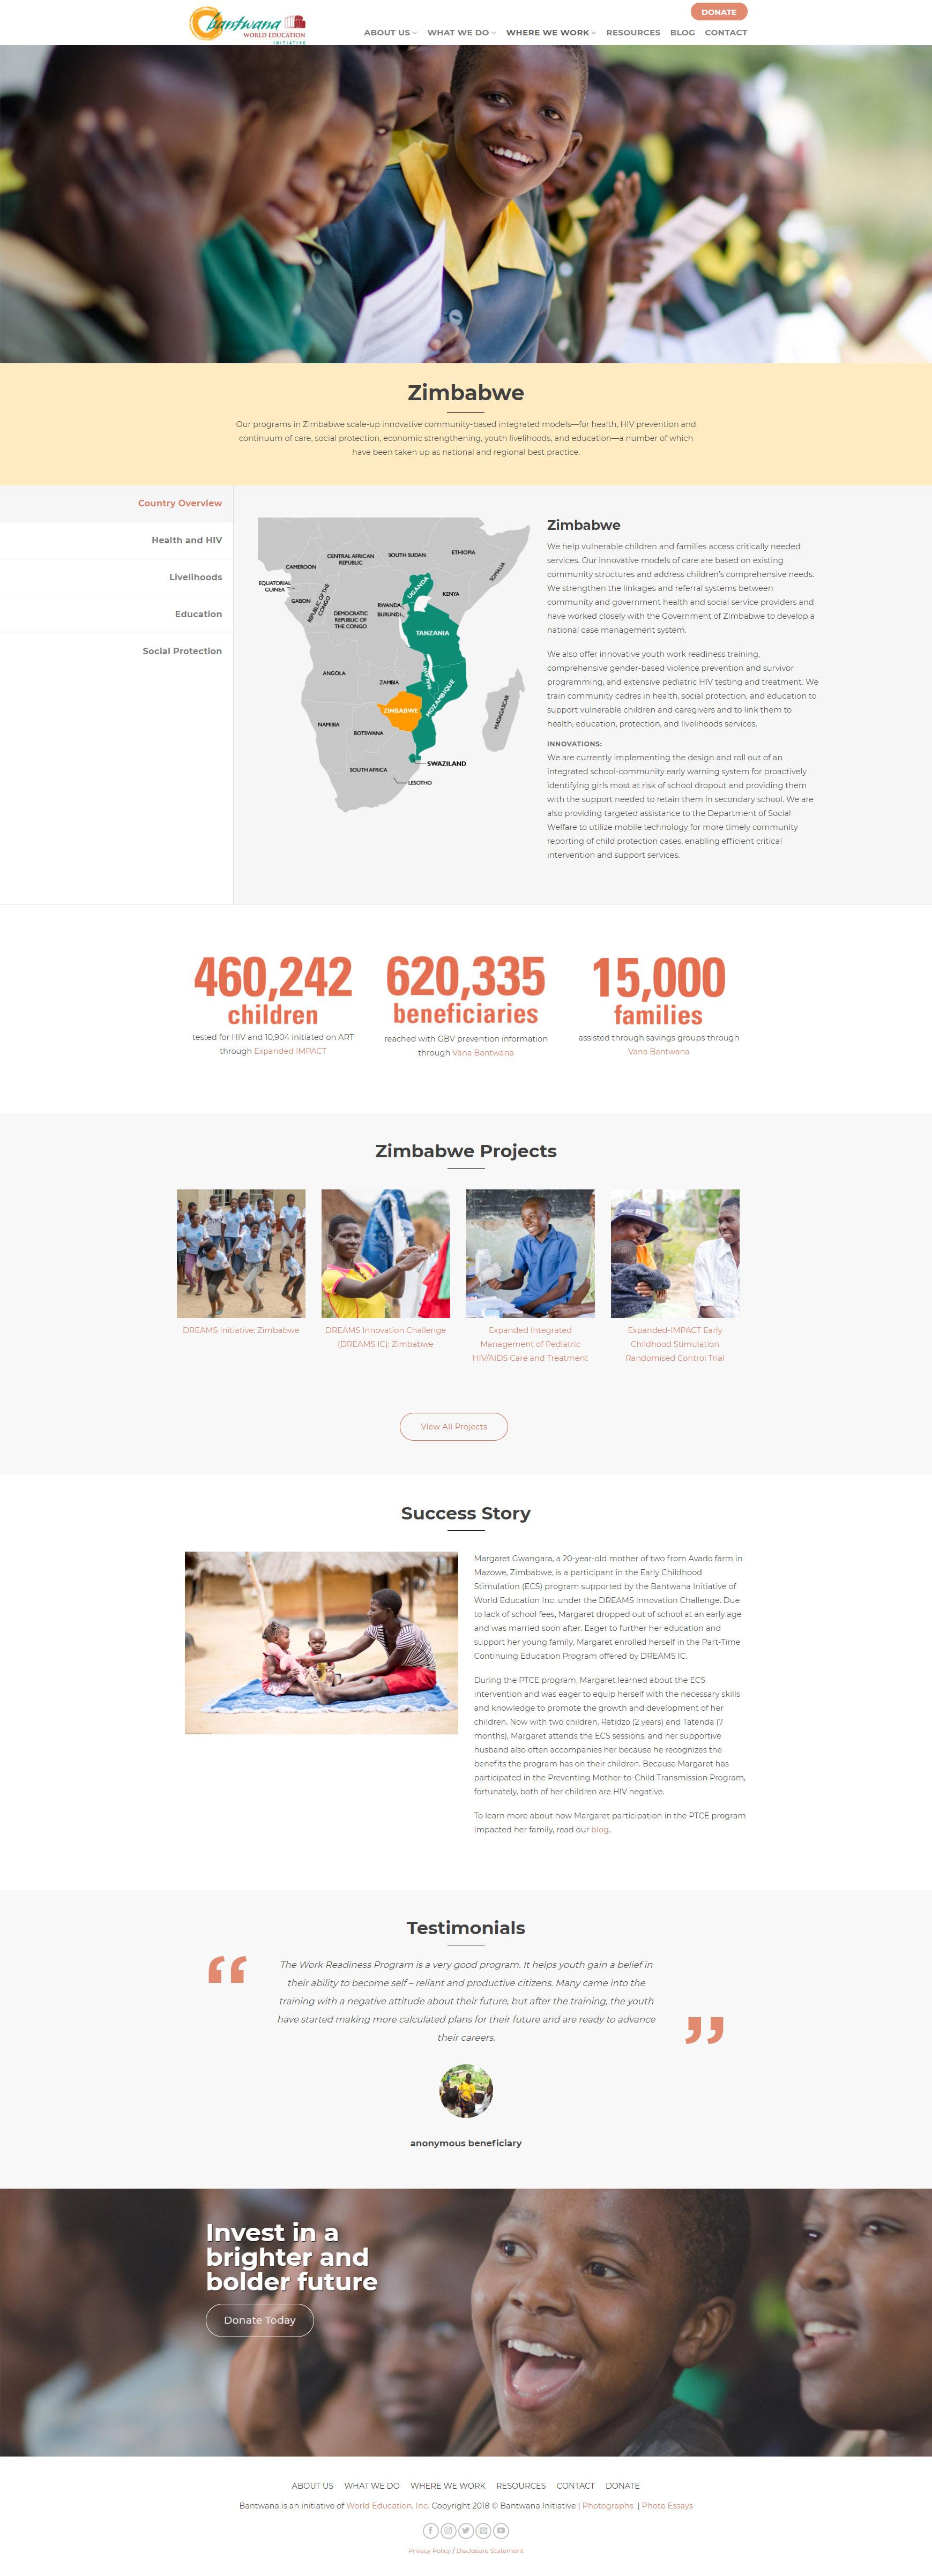 Bantwana - Enterprise Website Development and Design Project